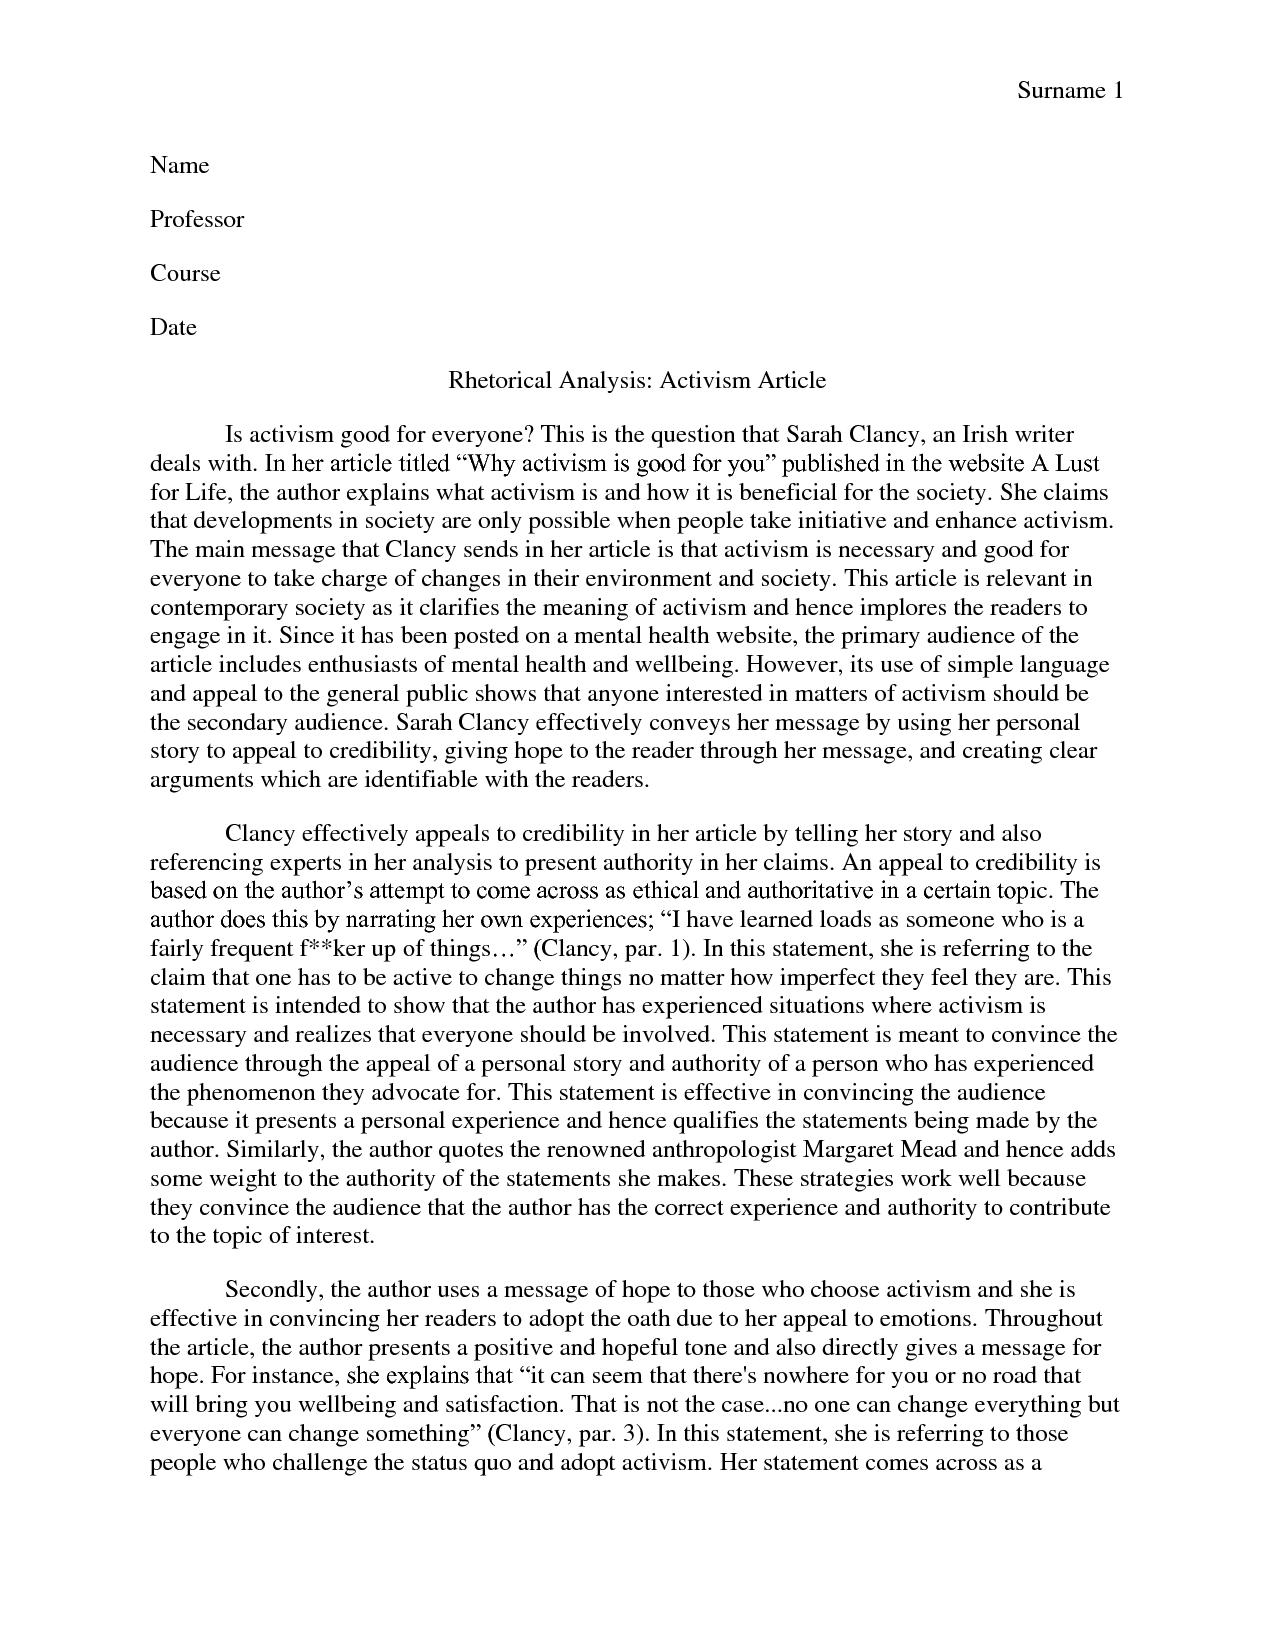 Write my rhetorical analysis essay on shakespeare how to write minuites